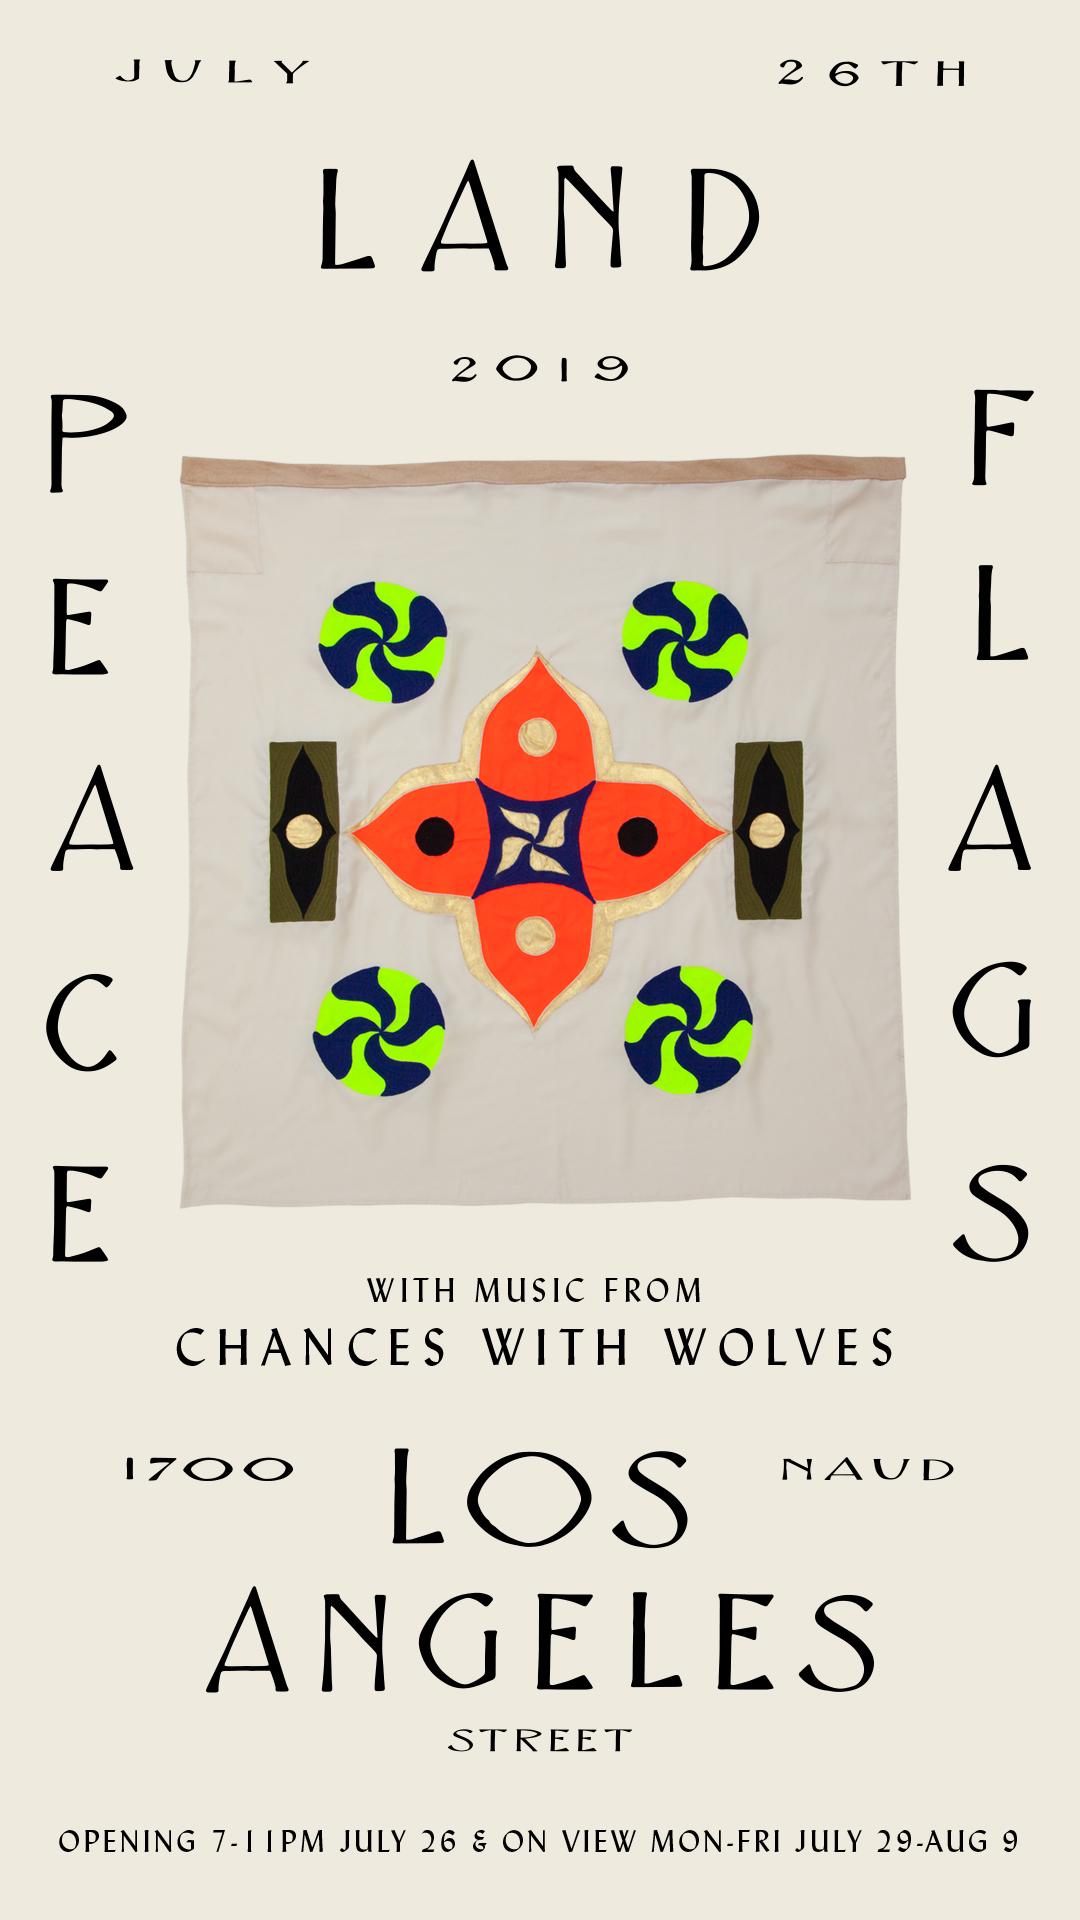 LAND_PEACE_FLAGS_2019.jpg